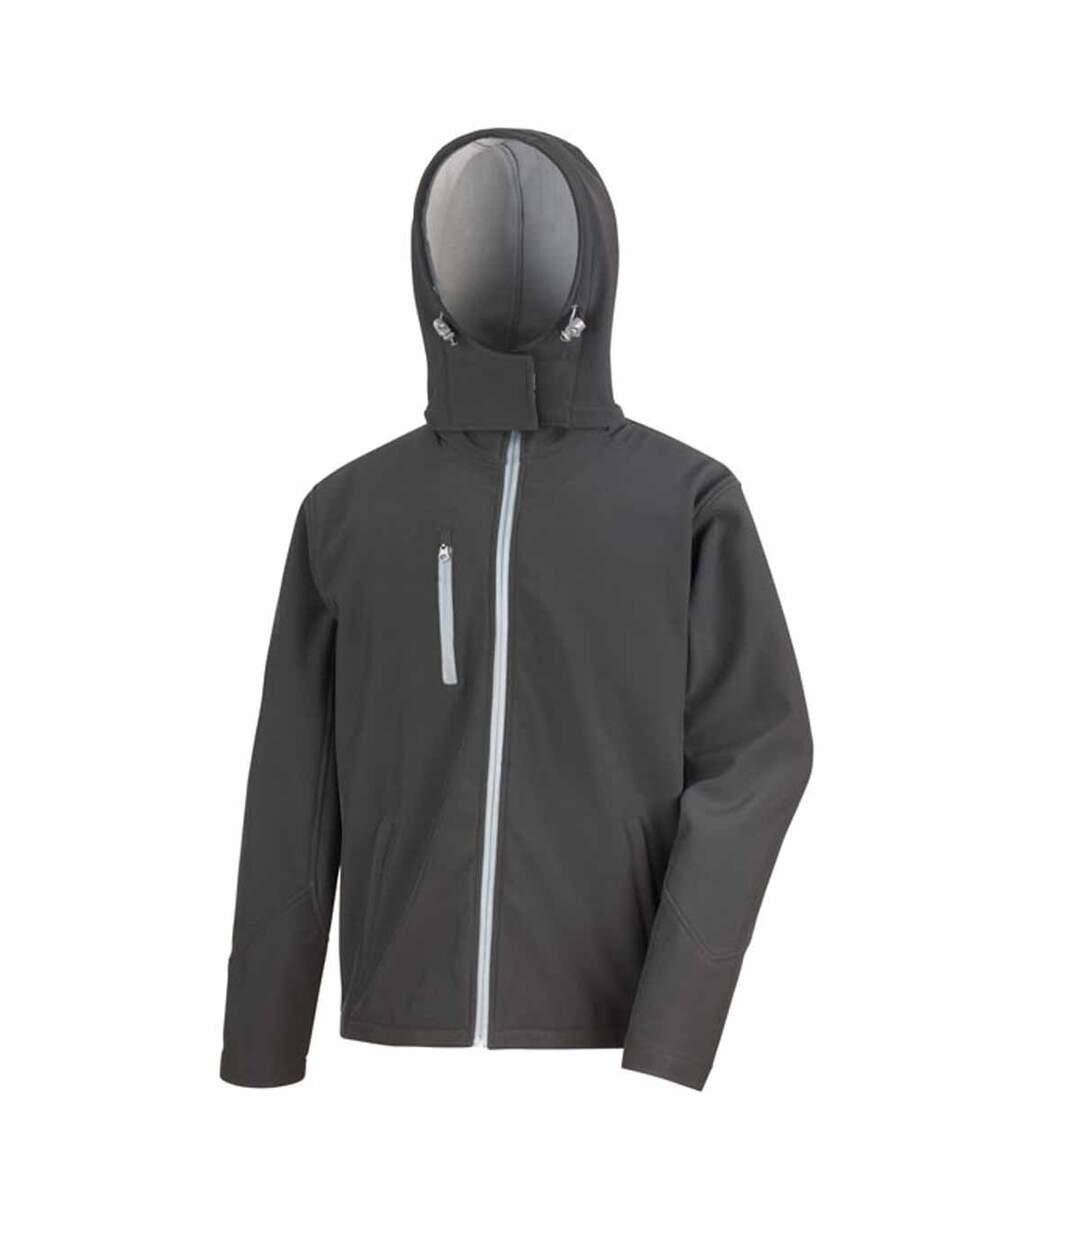 Veste softshell performance - R230M - Homme - noir